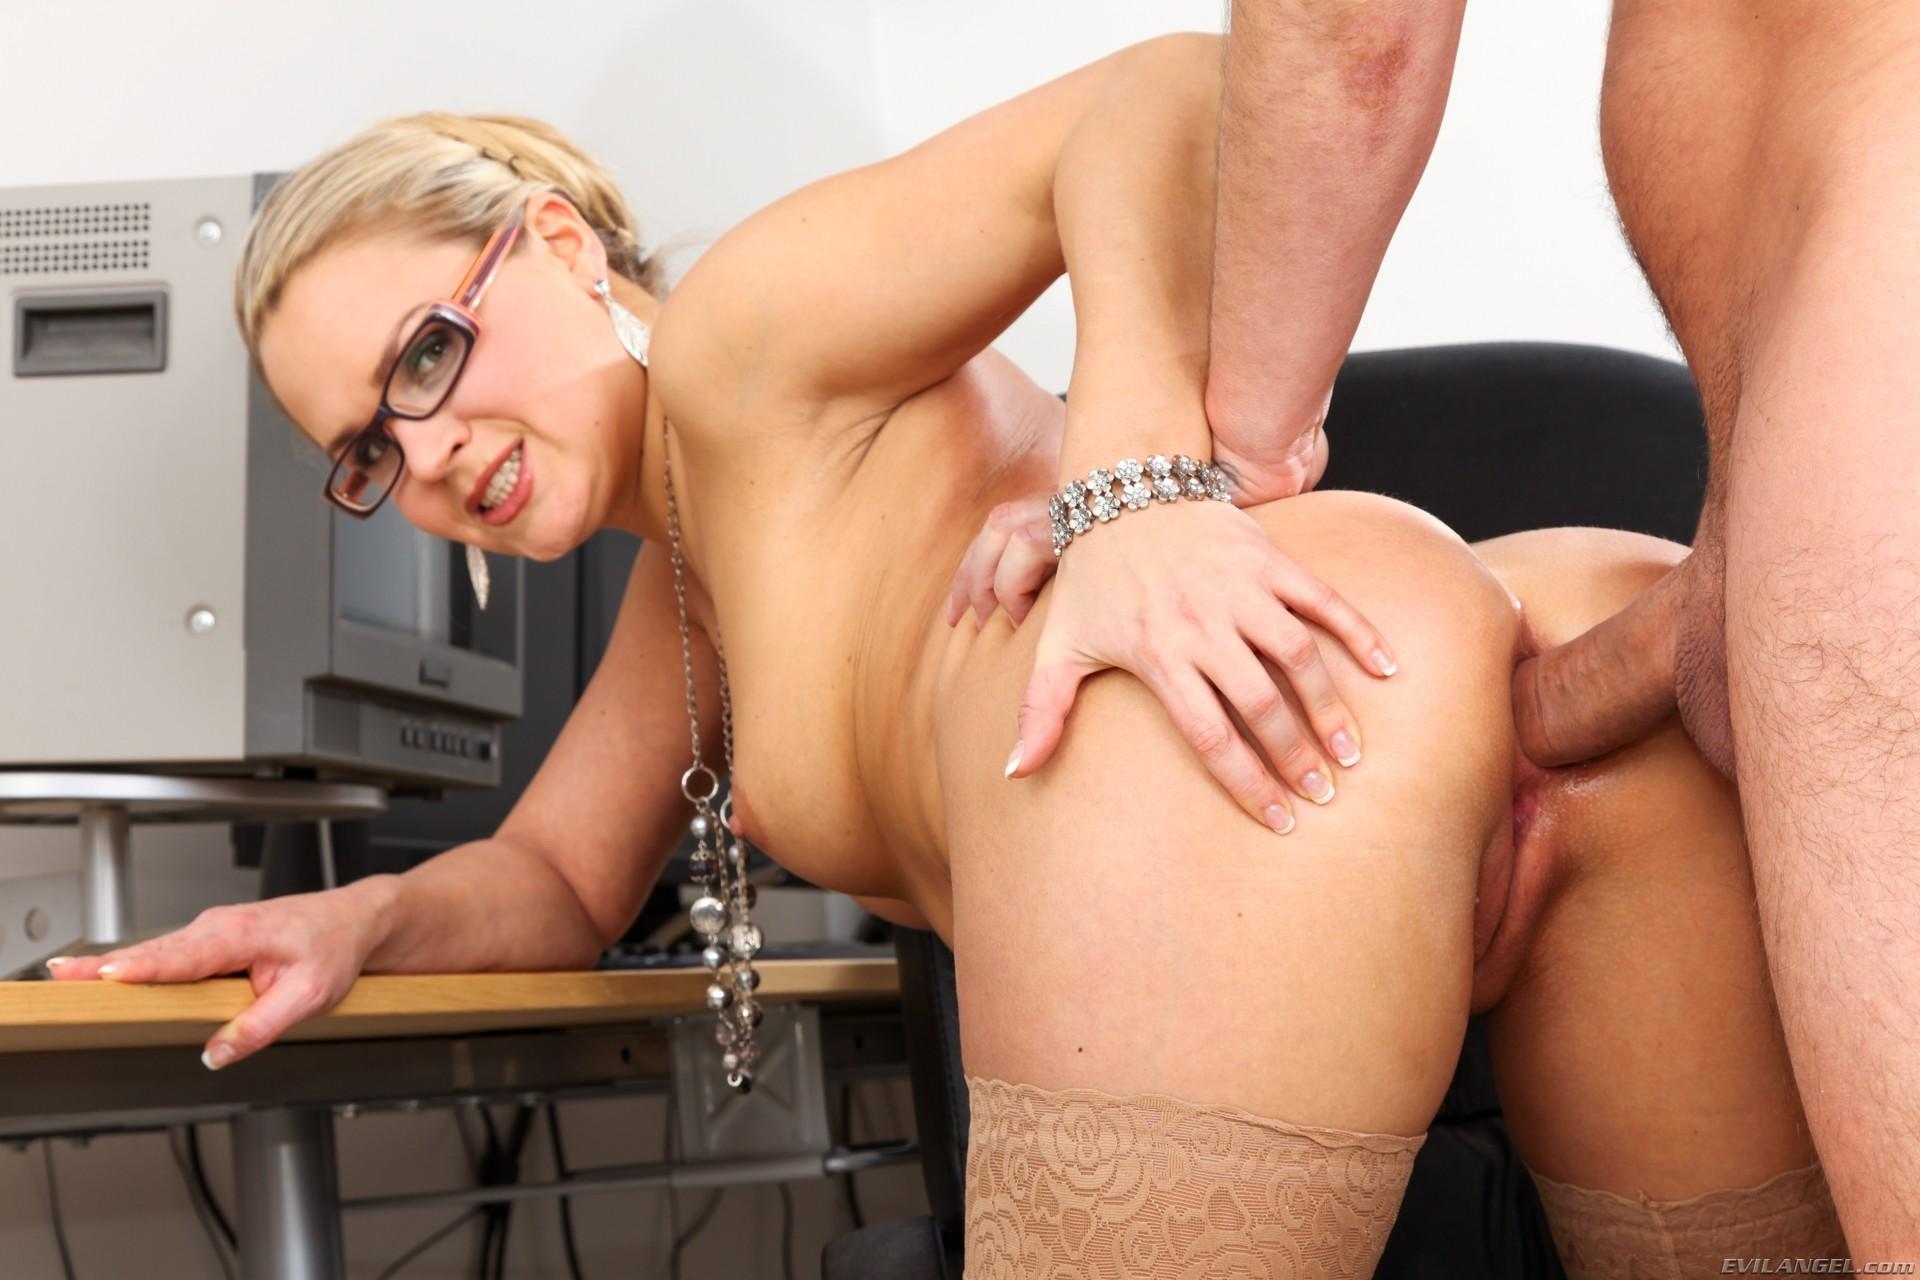 блондинка жена трахается боссам эротика брюнеточкой